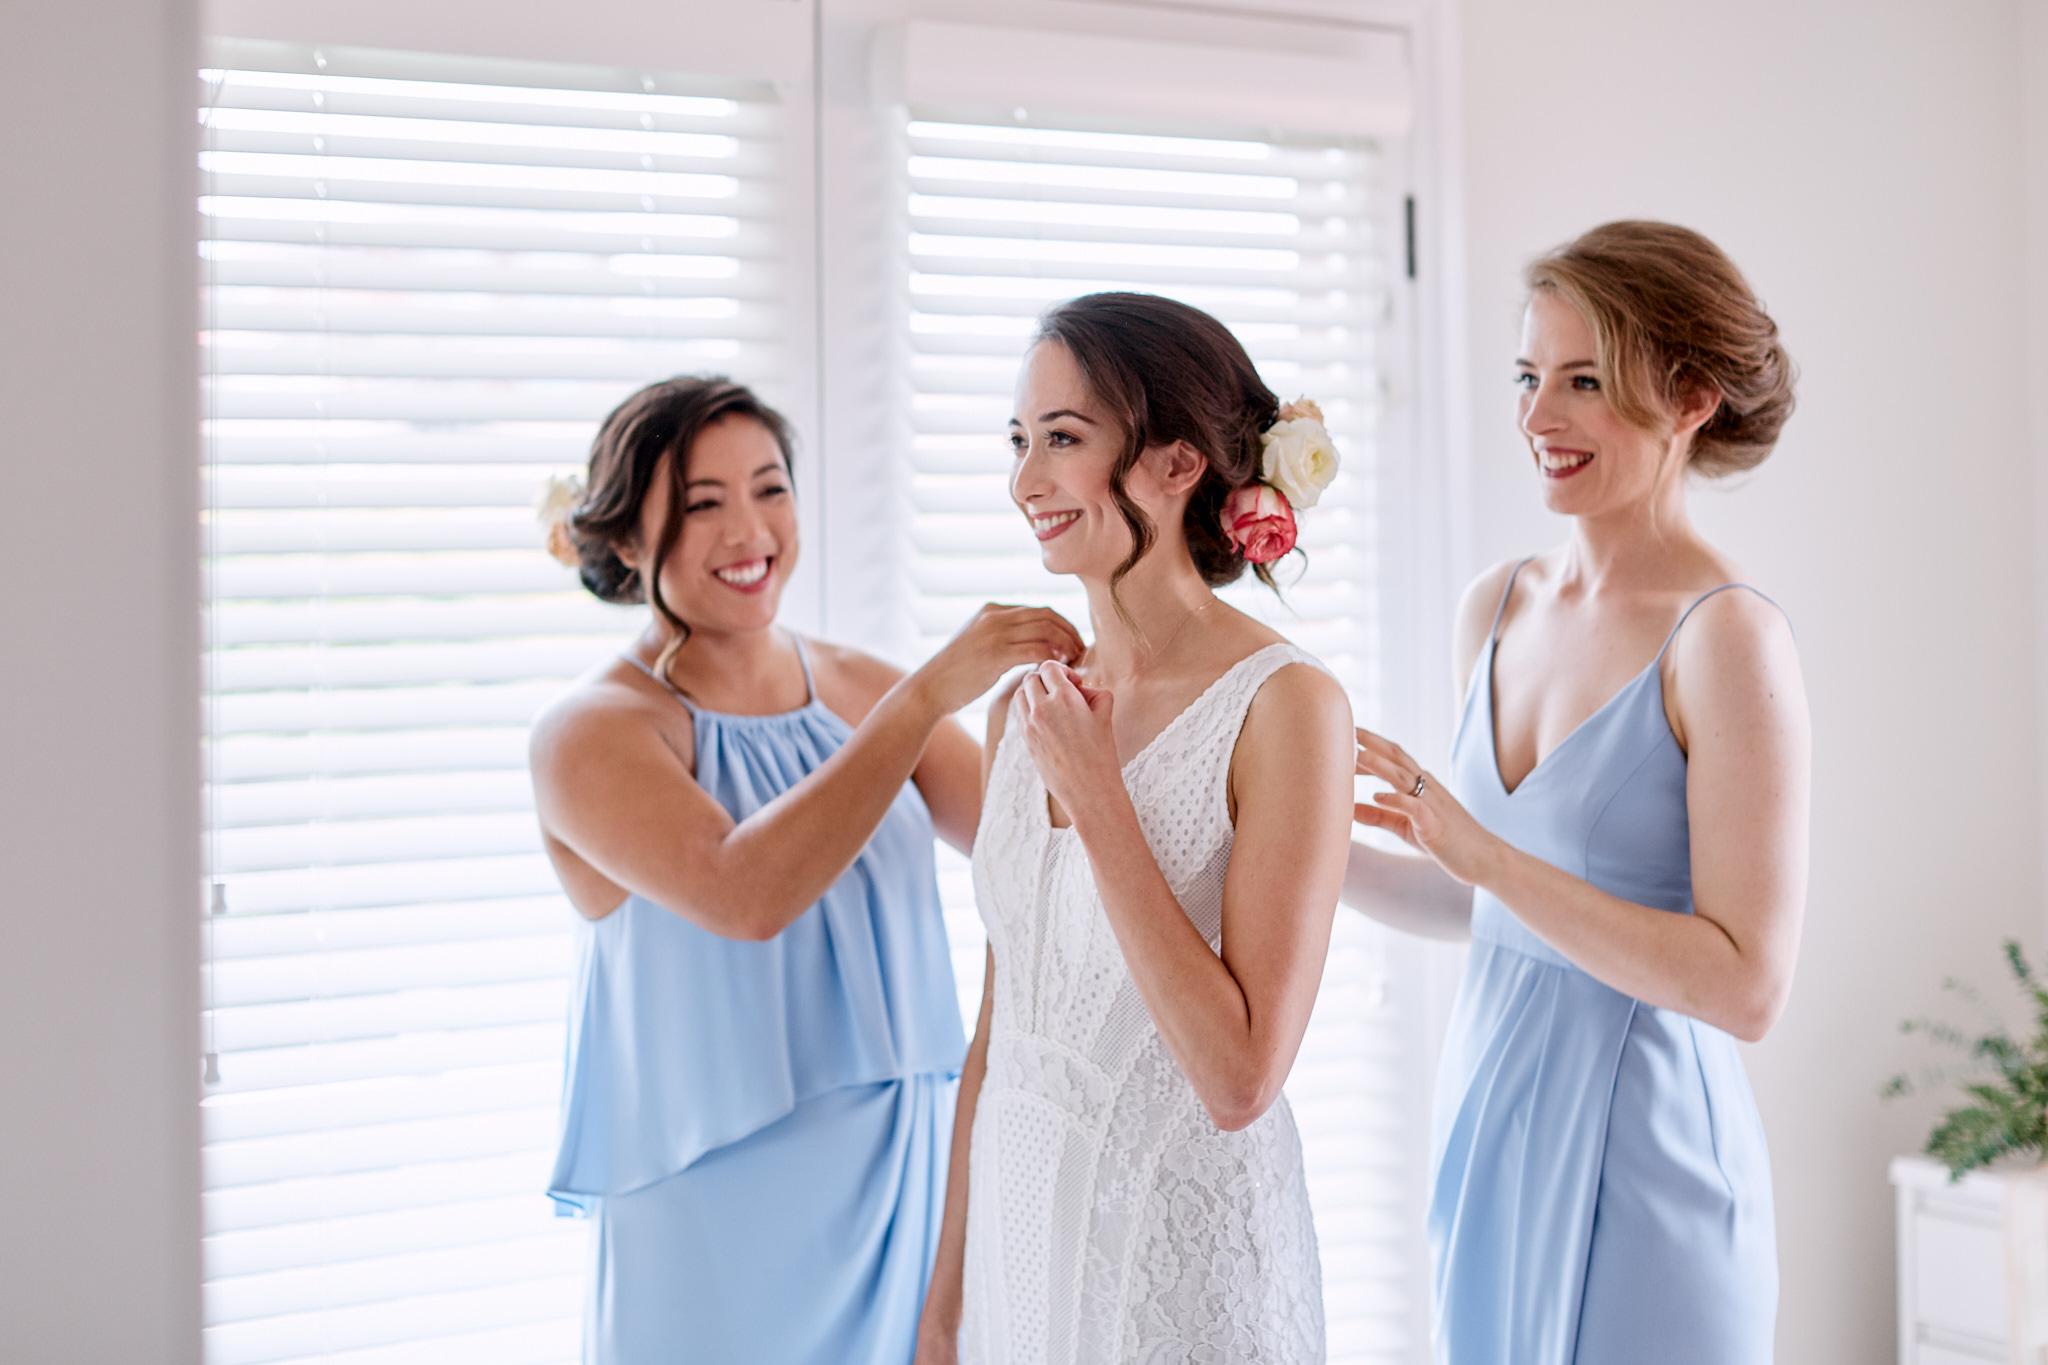 bride putting necklace on.jpg